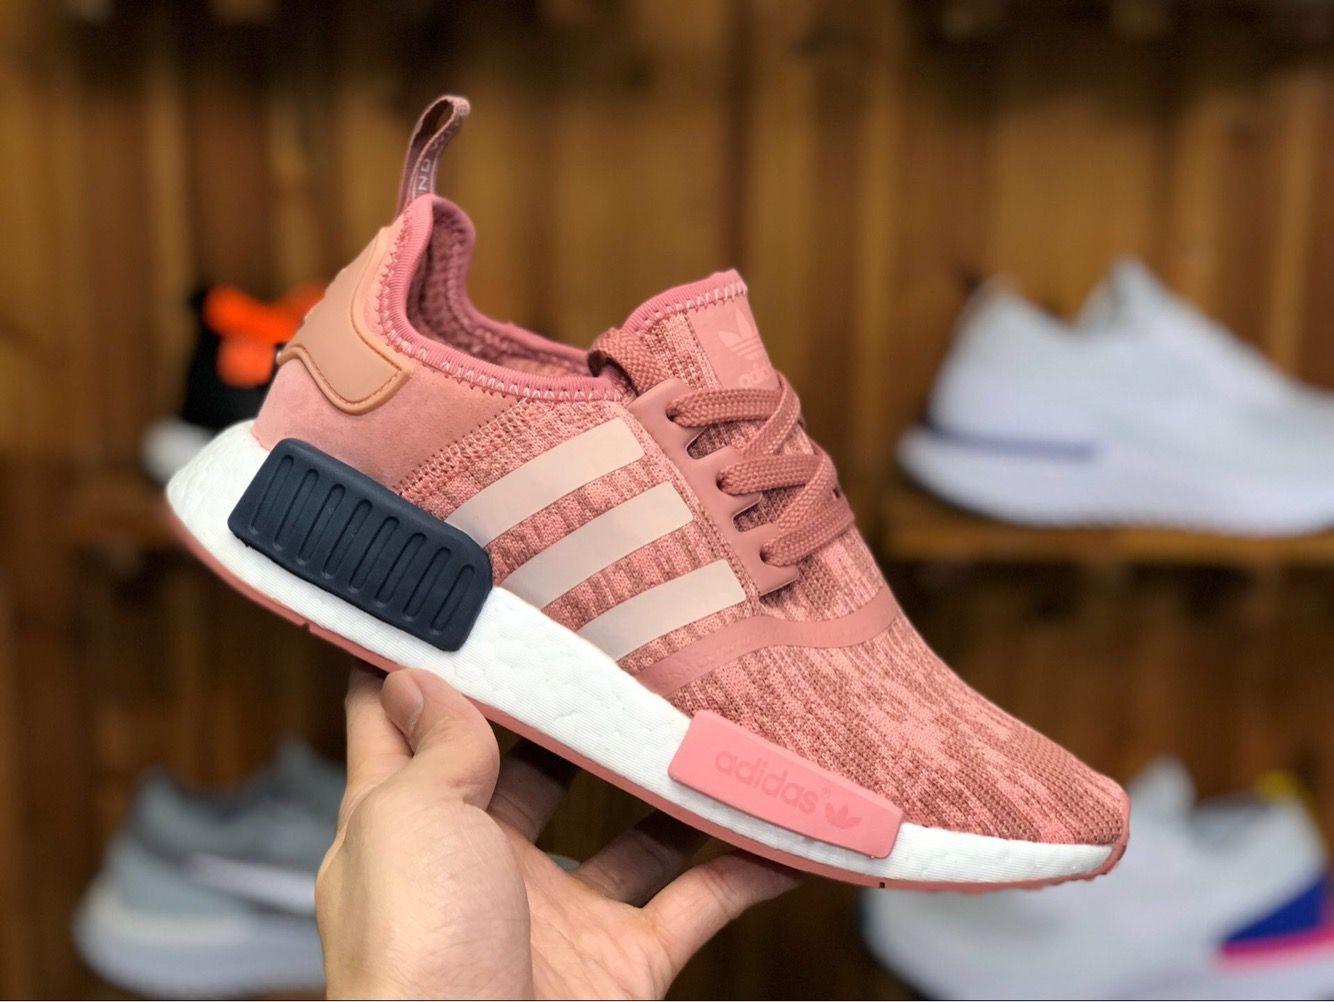 cf2f052a5dc24 65 Adidas Originals NMD R1 Primeknit Raw Pink Sneakers